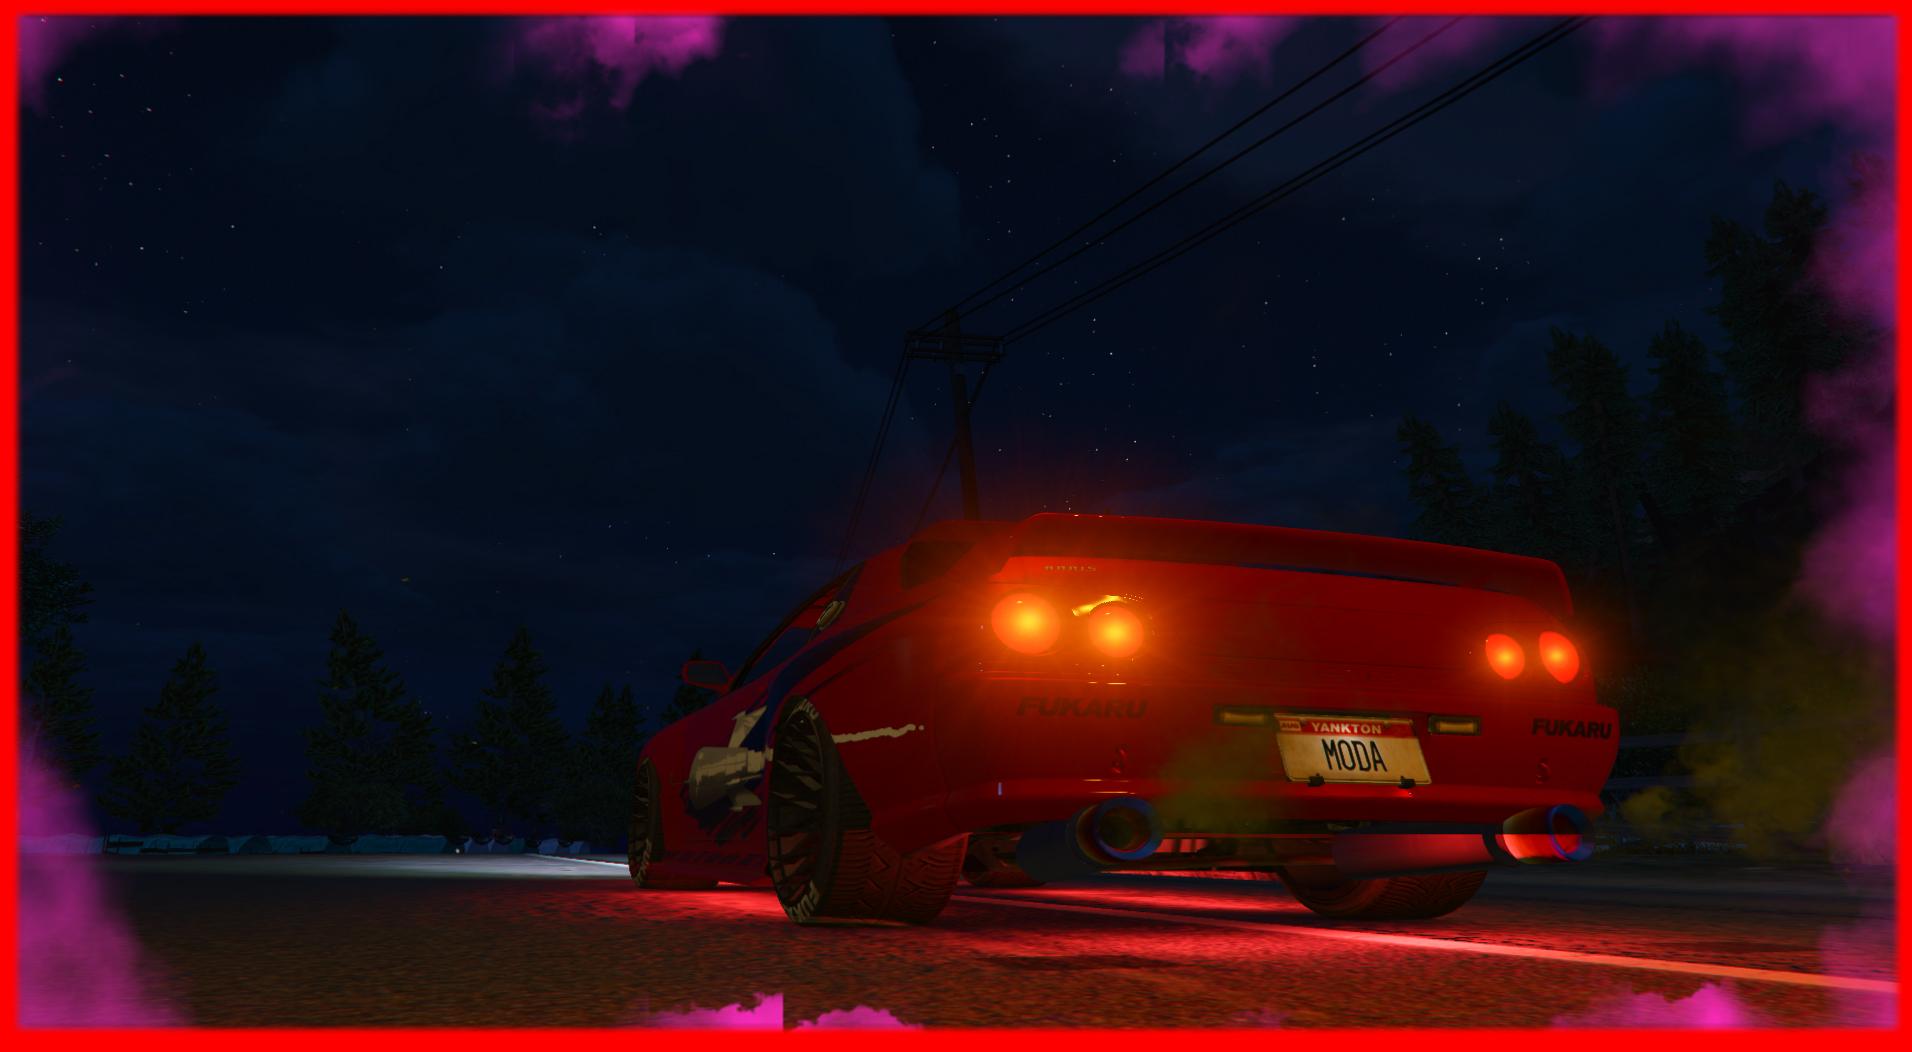 Grand_Theft_Auto_V_Screenshot_2021.02.26_-_19.32.jpg